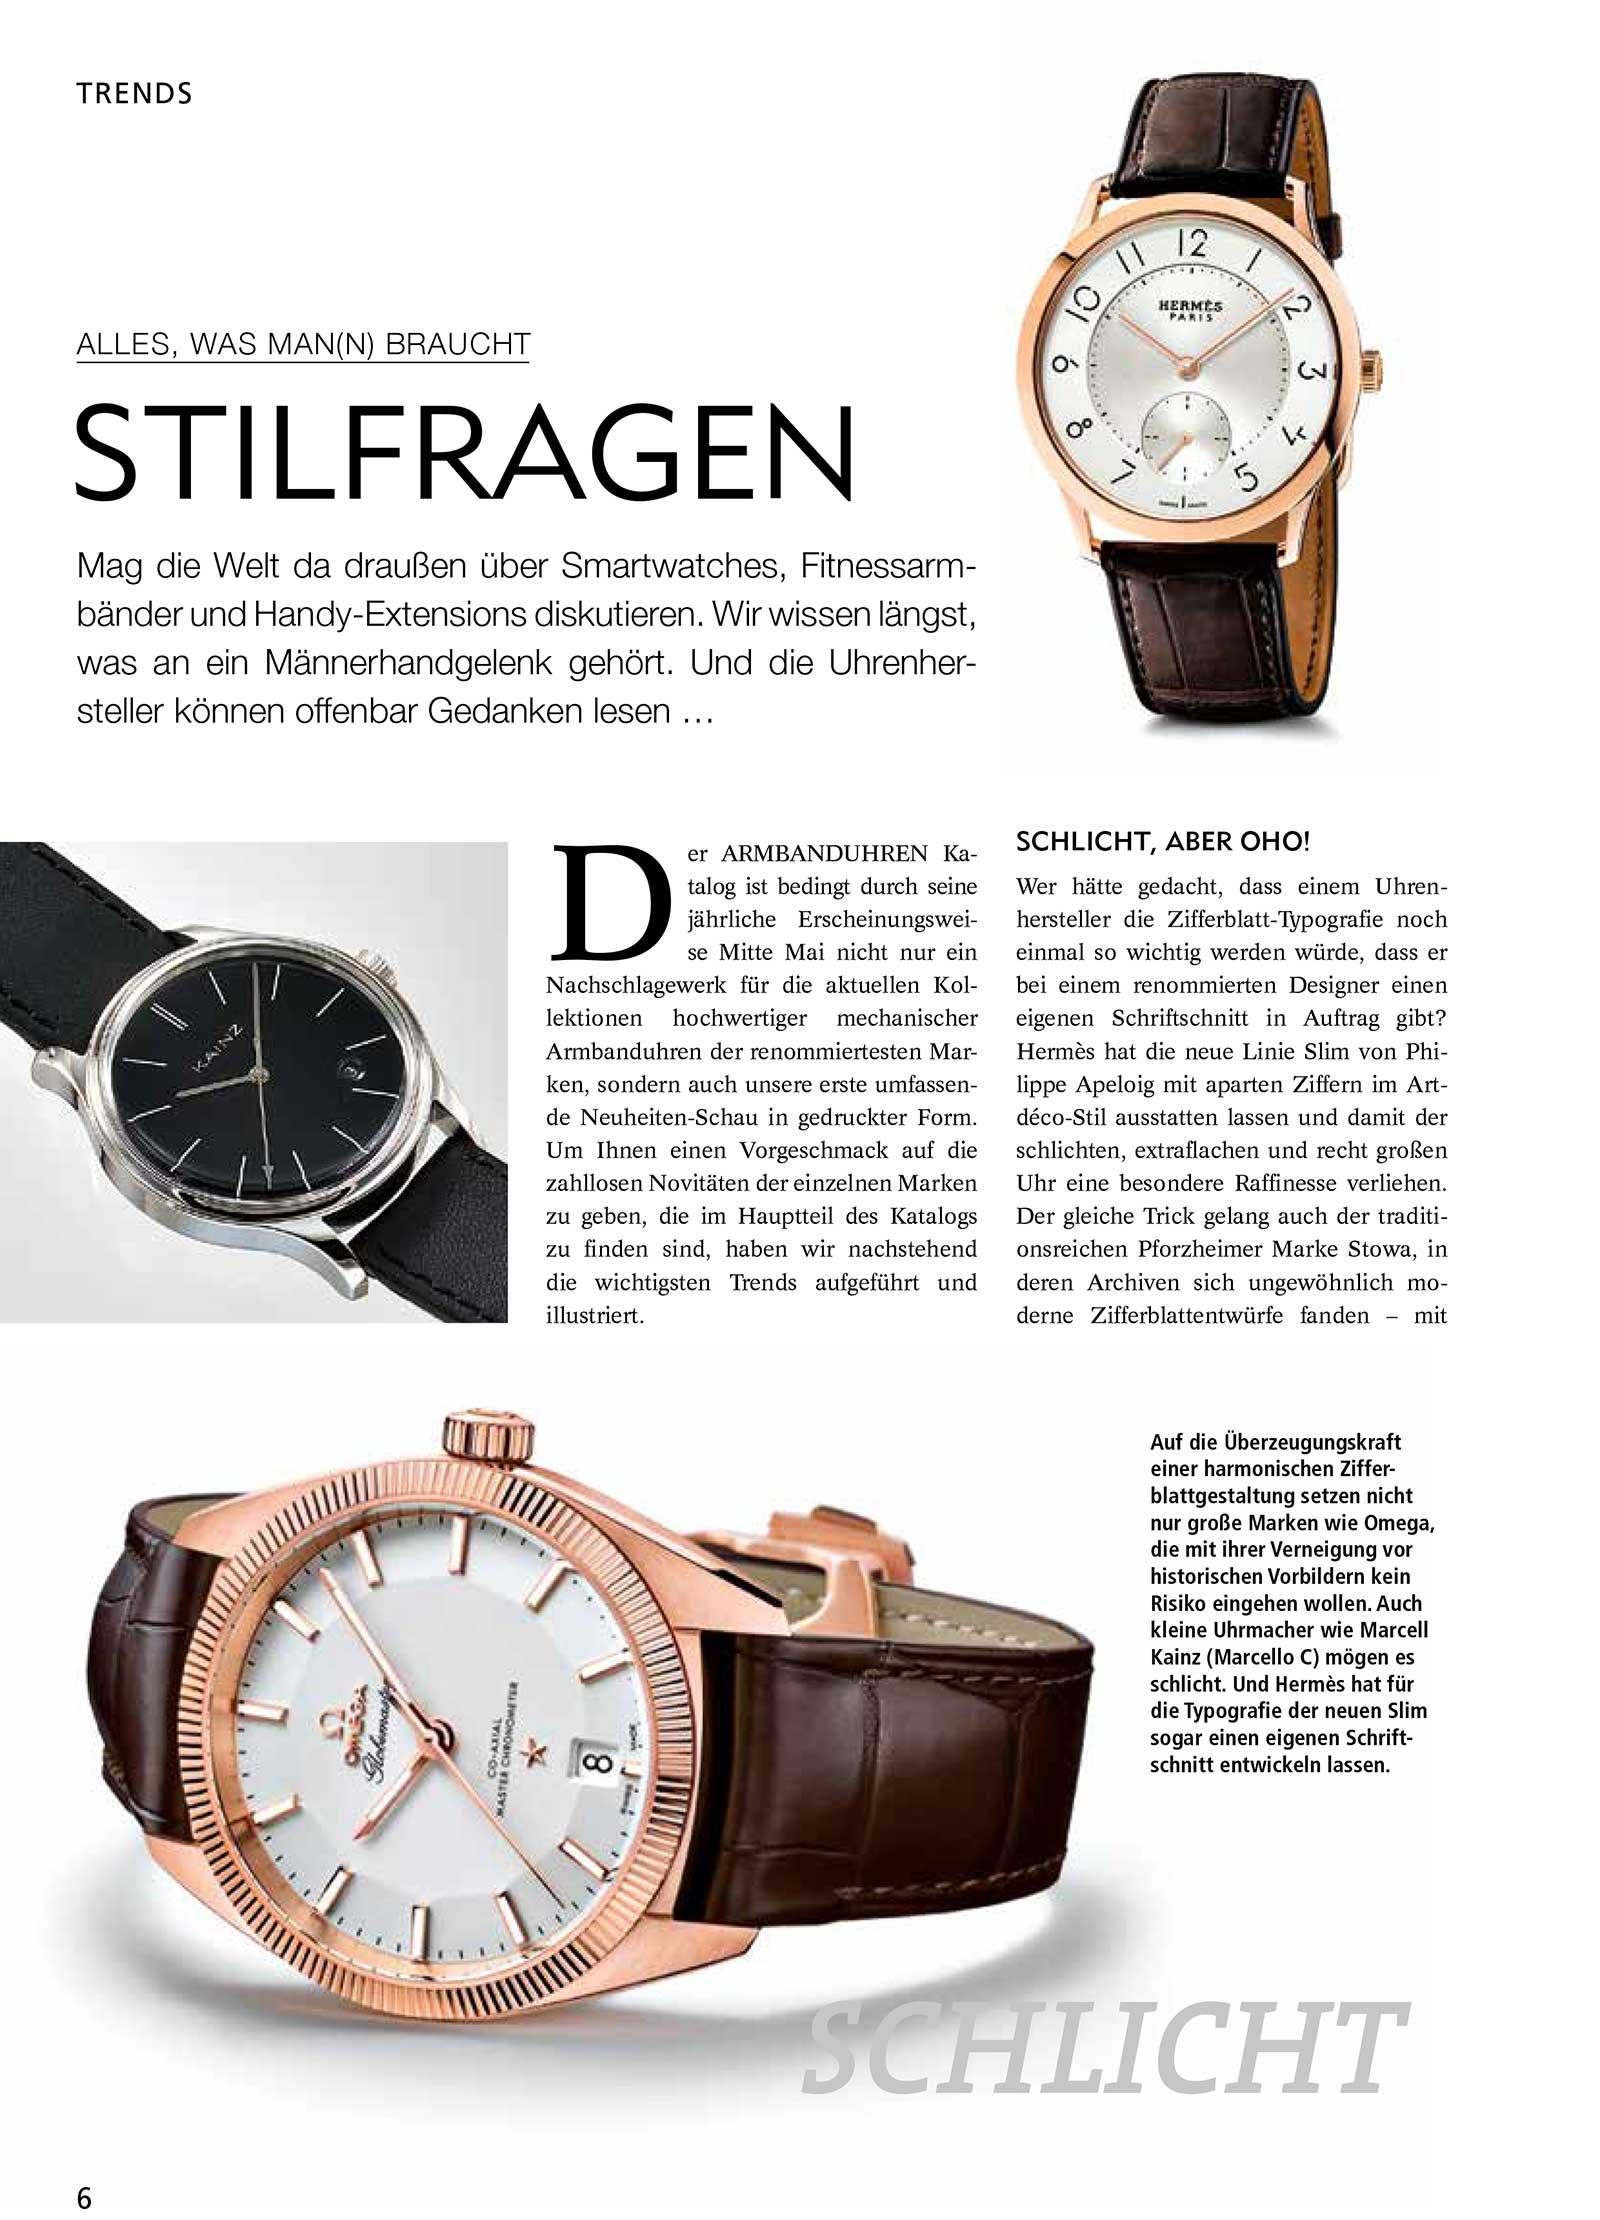 Armbanduhren Katalog 2015